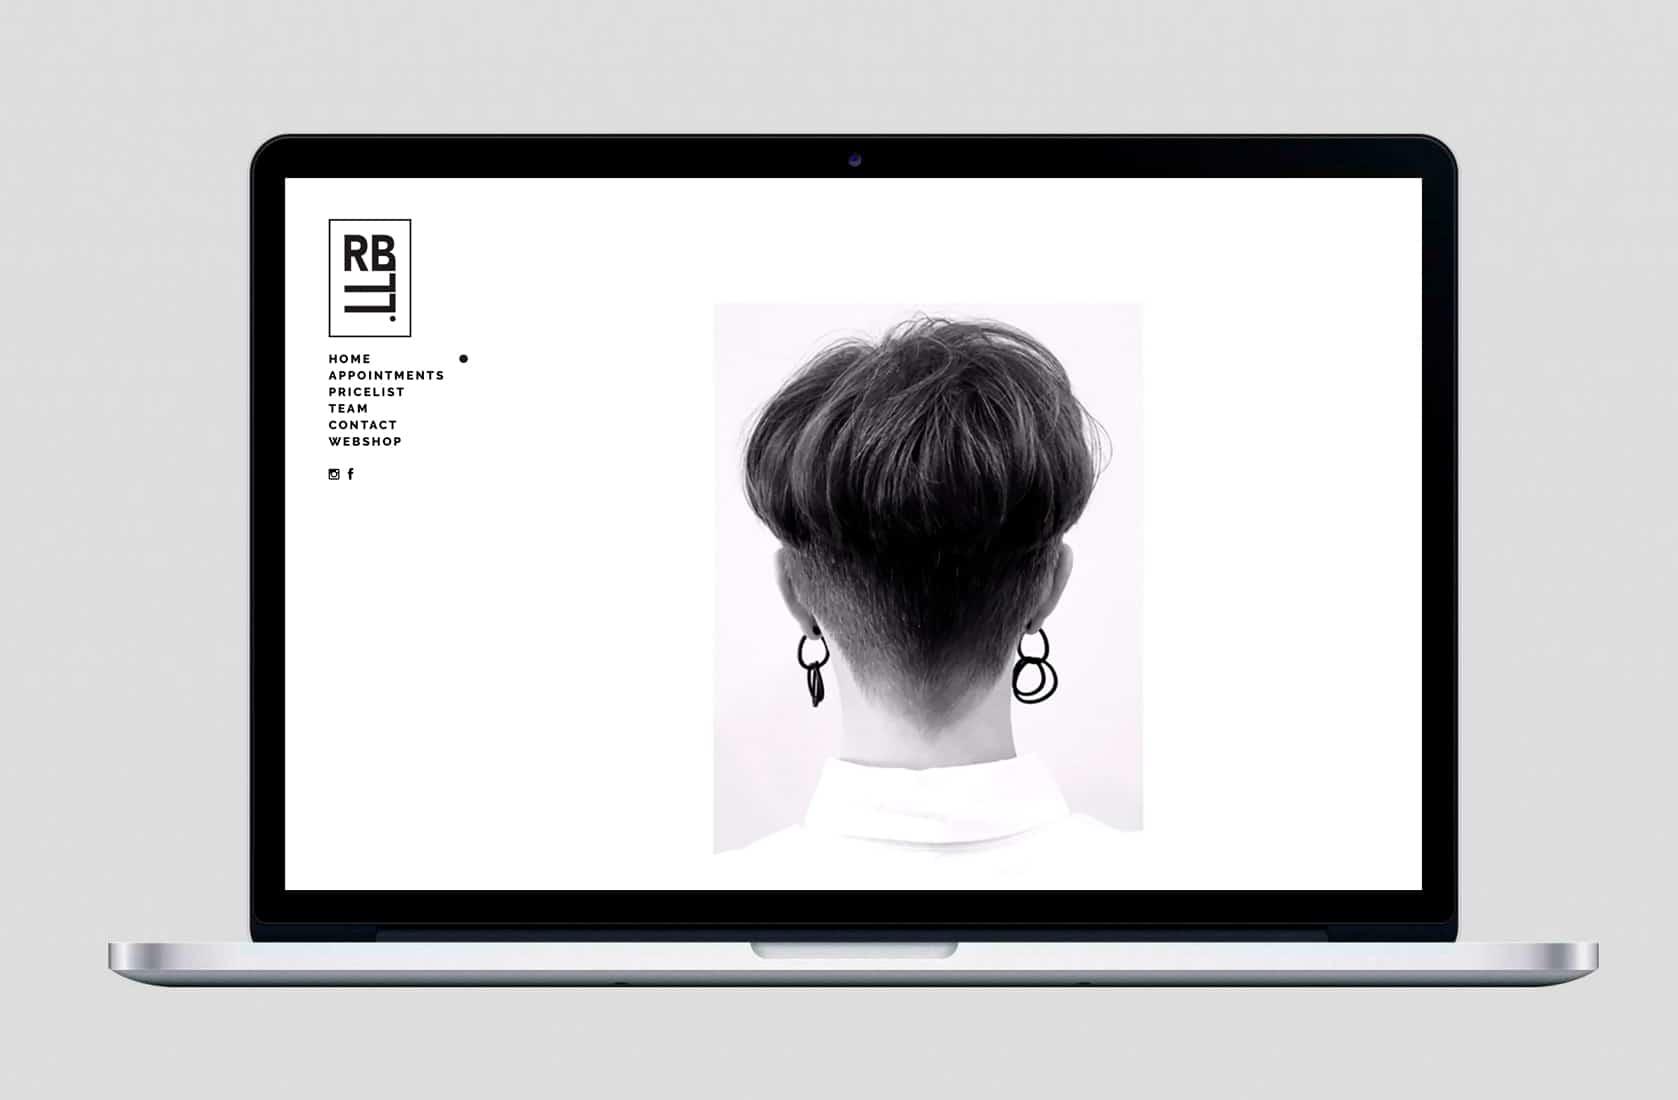 RBLL webdesign